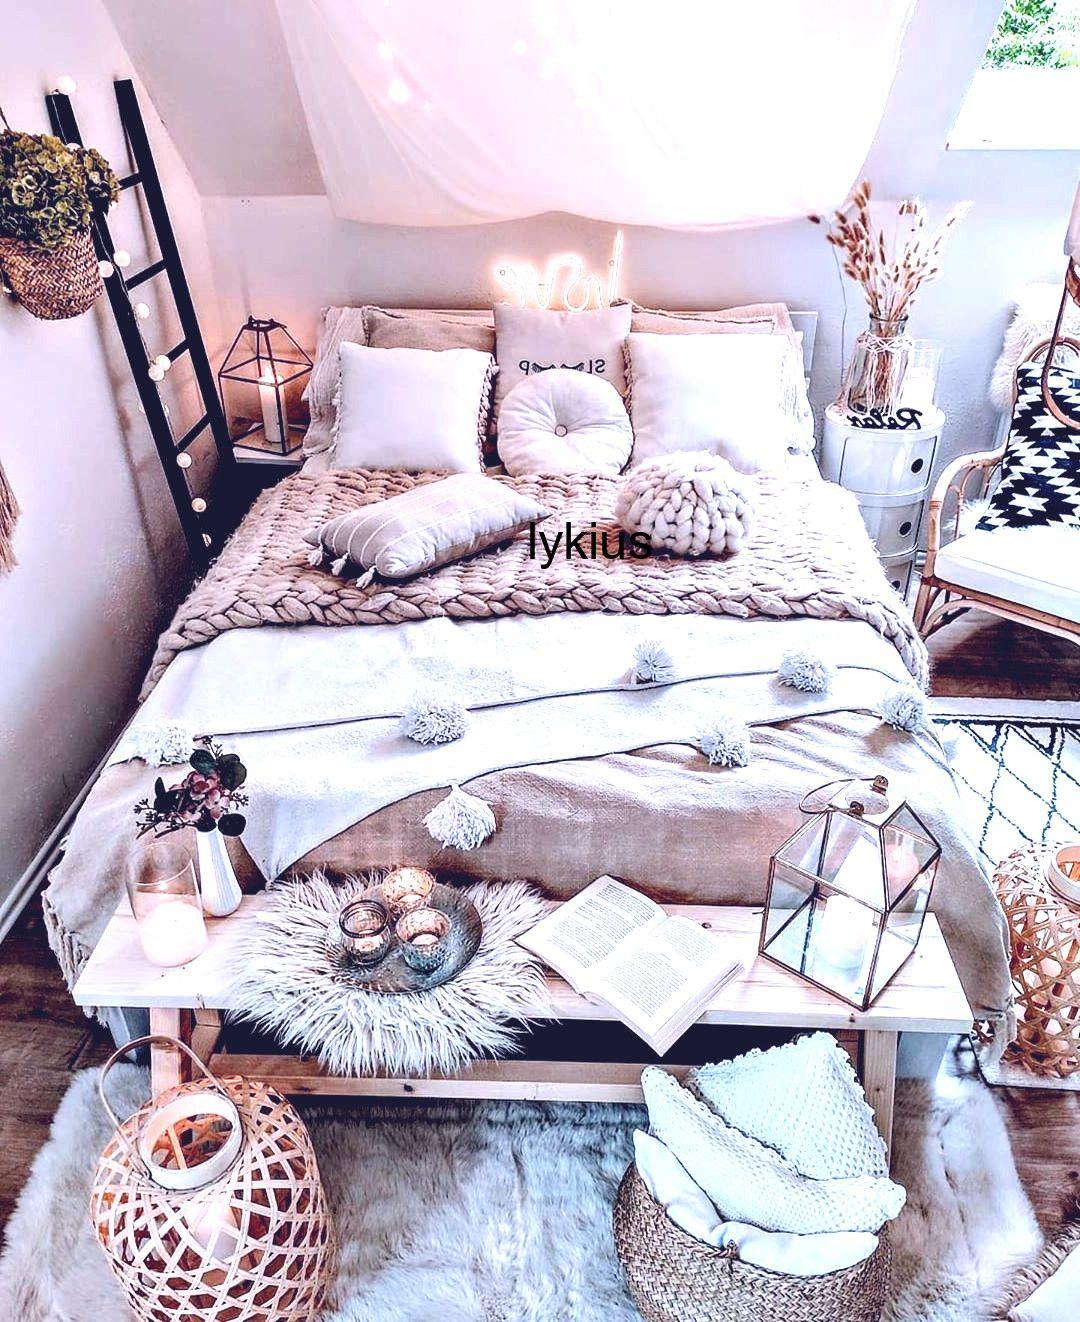 bohemian home accessories #home #accessories #homeaccessories Bohemian Style Ideas For Bedroom Decor #bohemianbedrooms